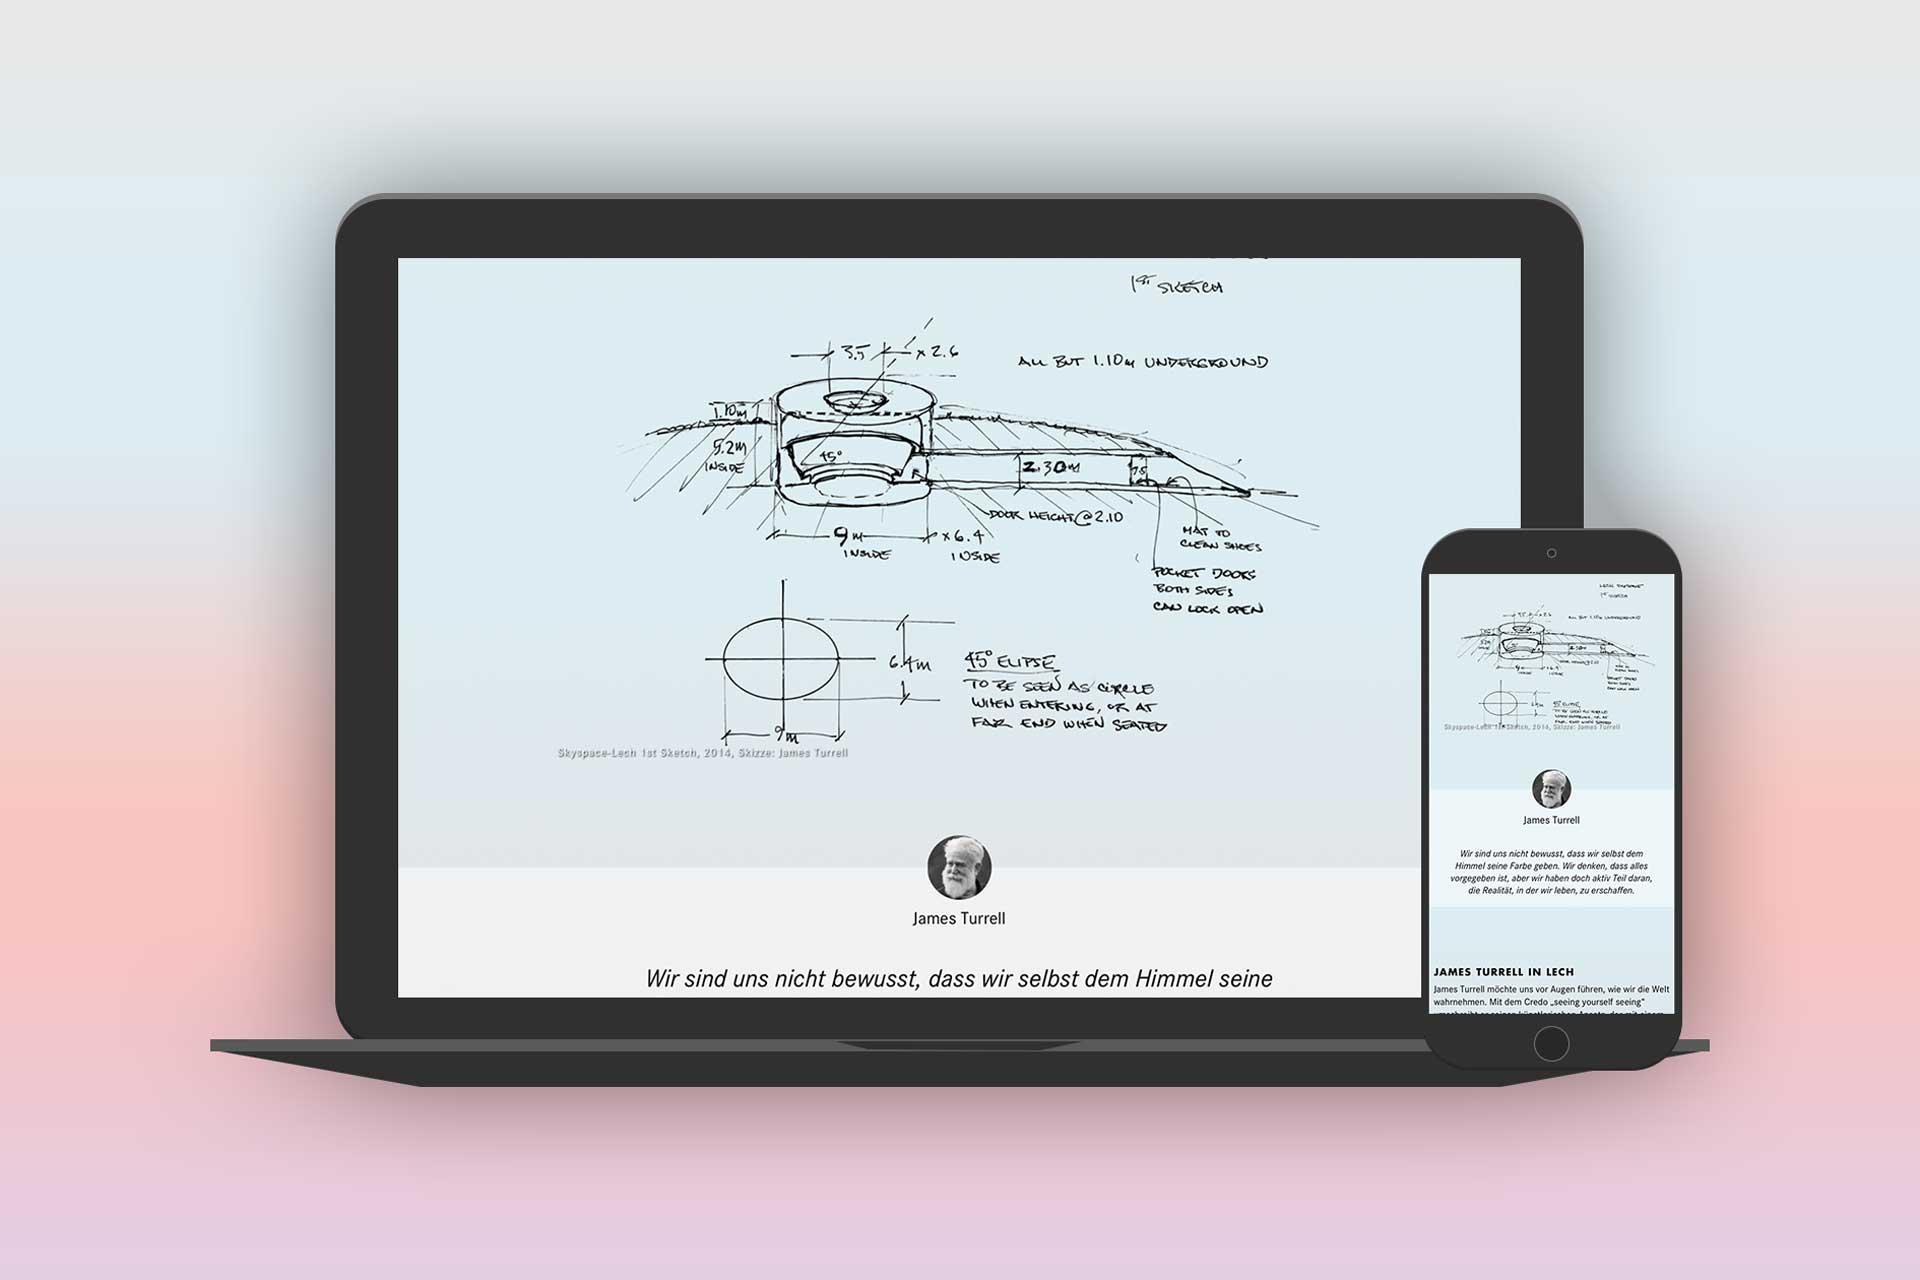 Designdetails, Webdesign skyspace Lech, UI, UX, Web, James Turrell, Kunst, Bernhard Hafele